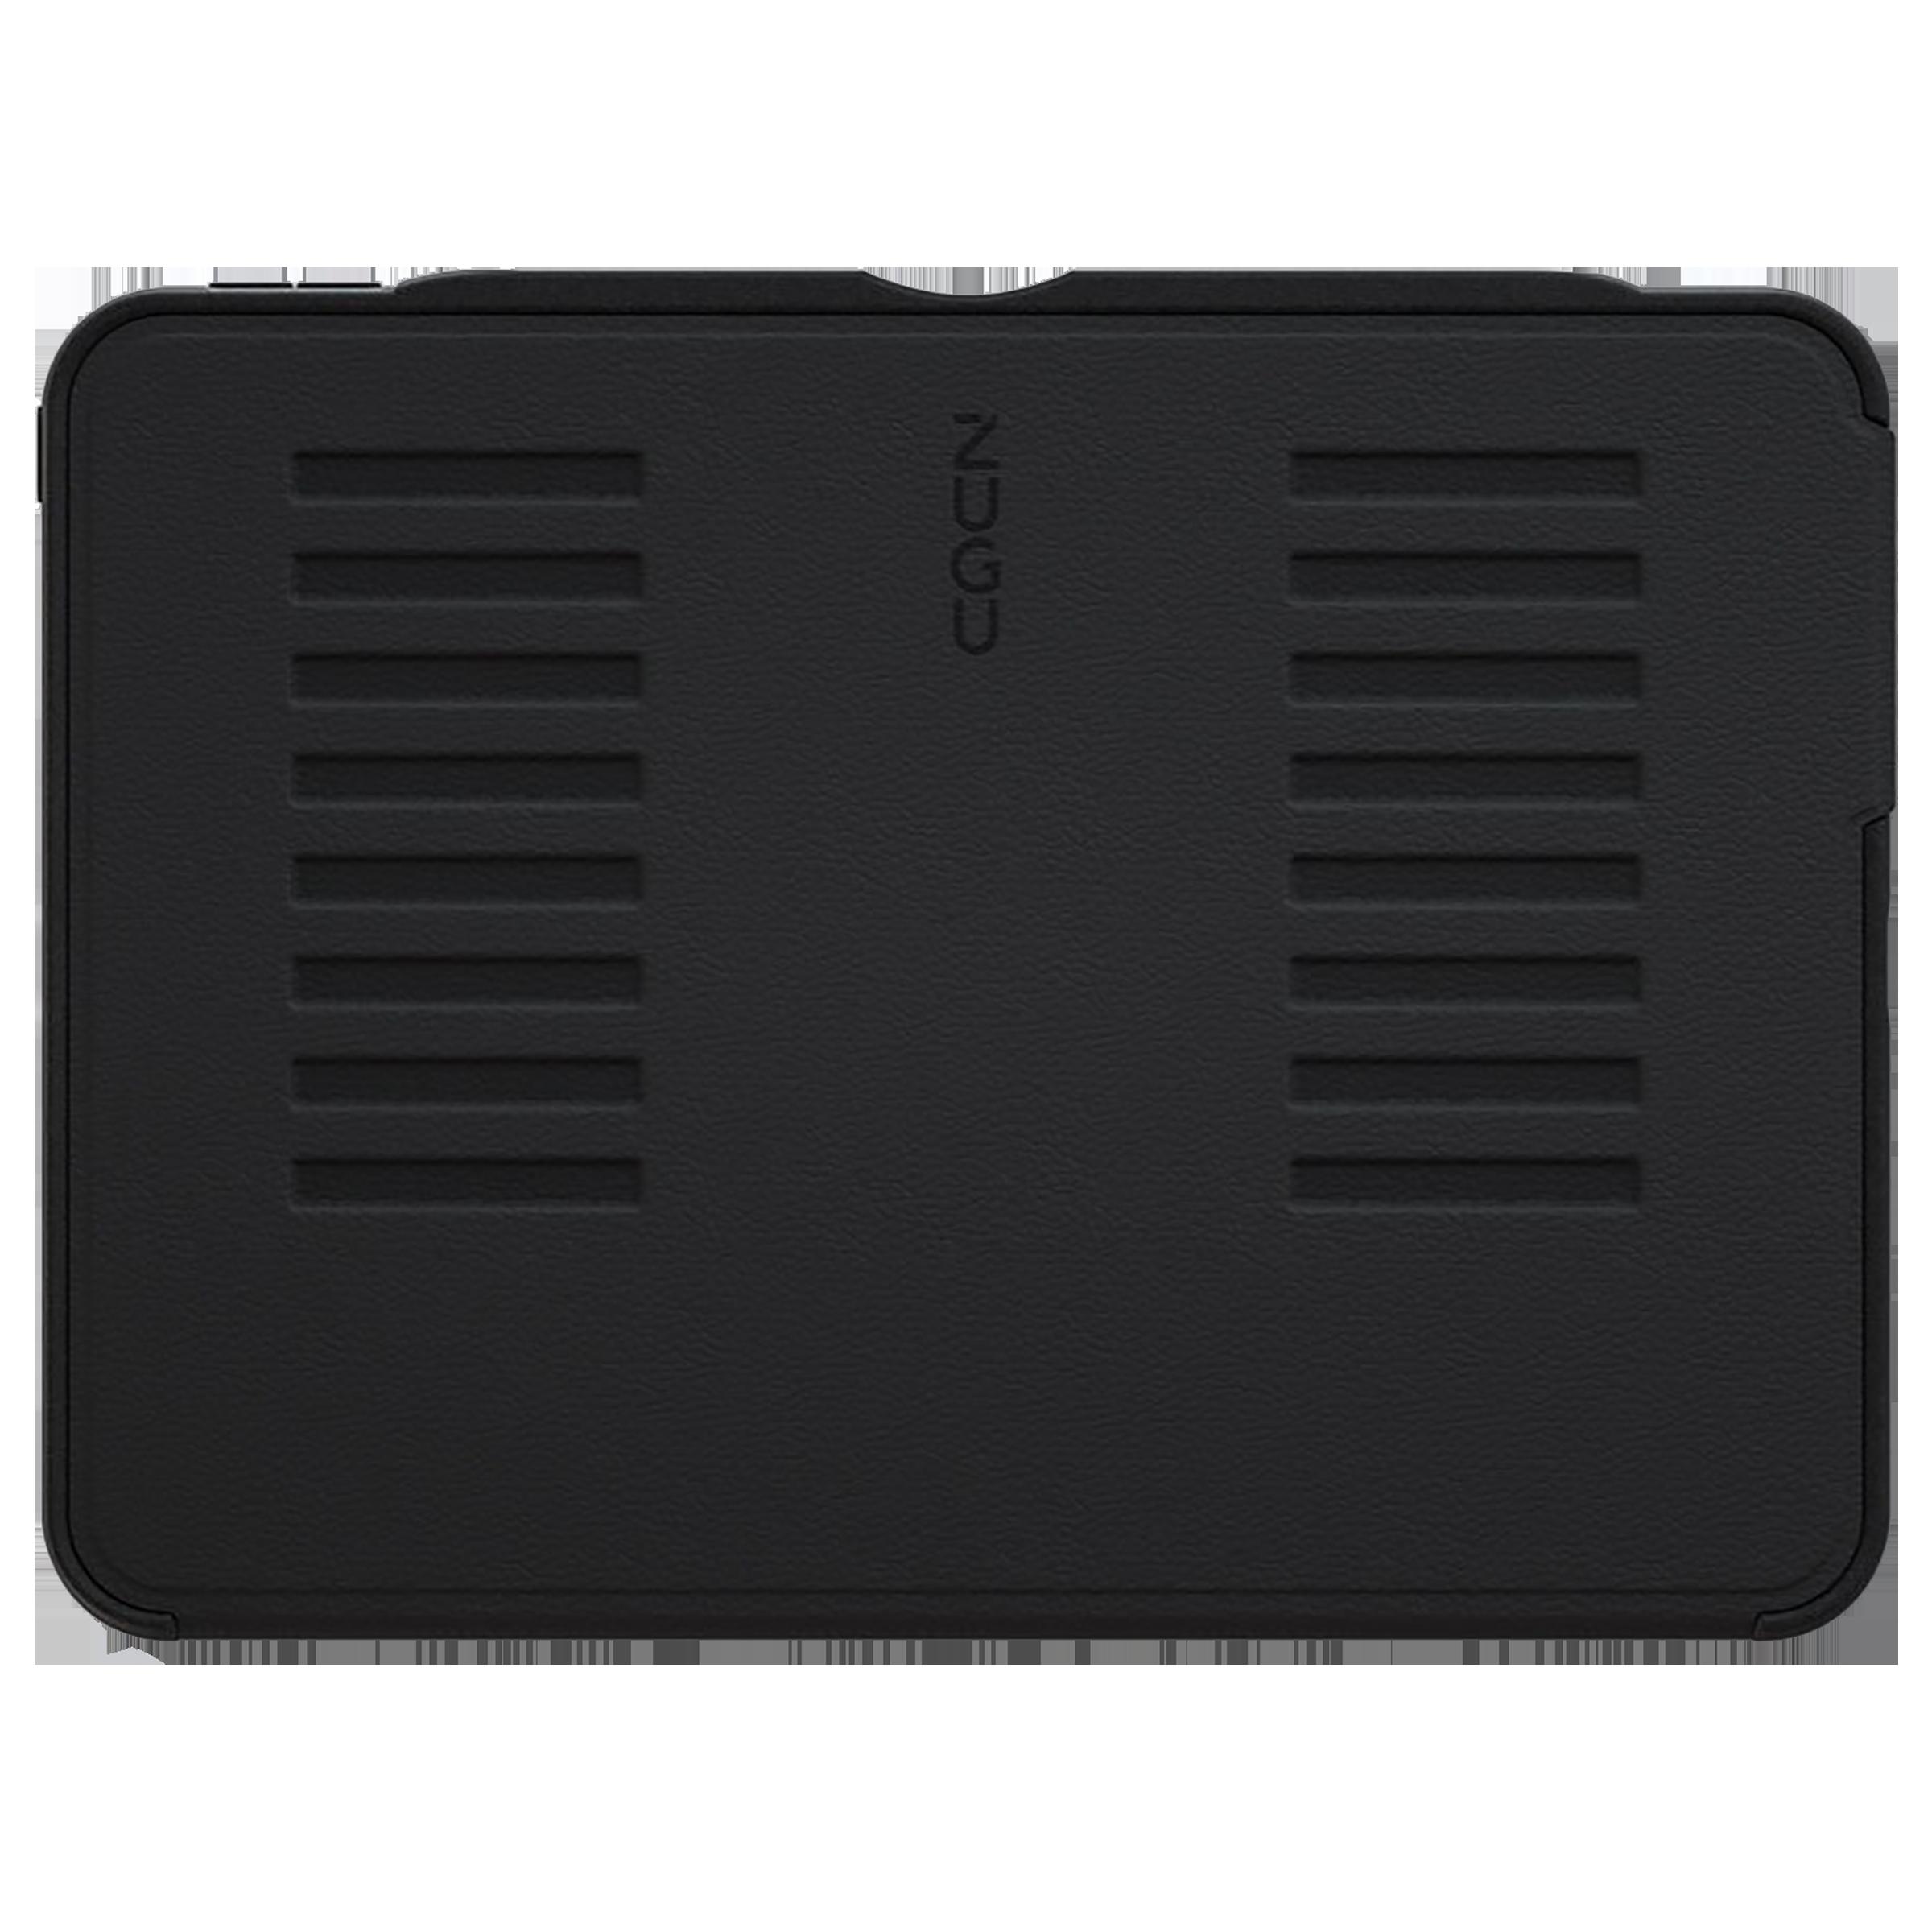 Zugu Microfiber Flip Case with Stand For Apple iPad Pro 11 Inch (Robust Bumper & Rugged TPU, ZG-21-11BLK, Black)_1